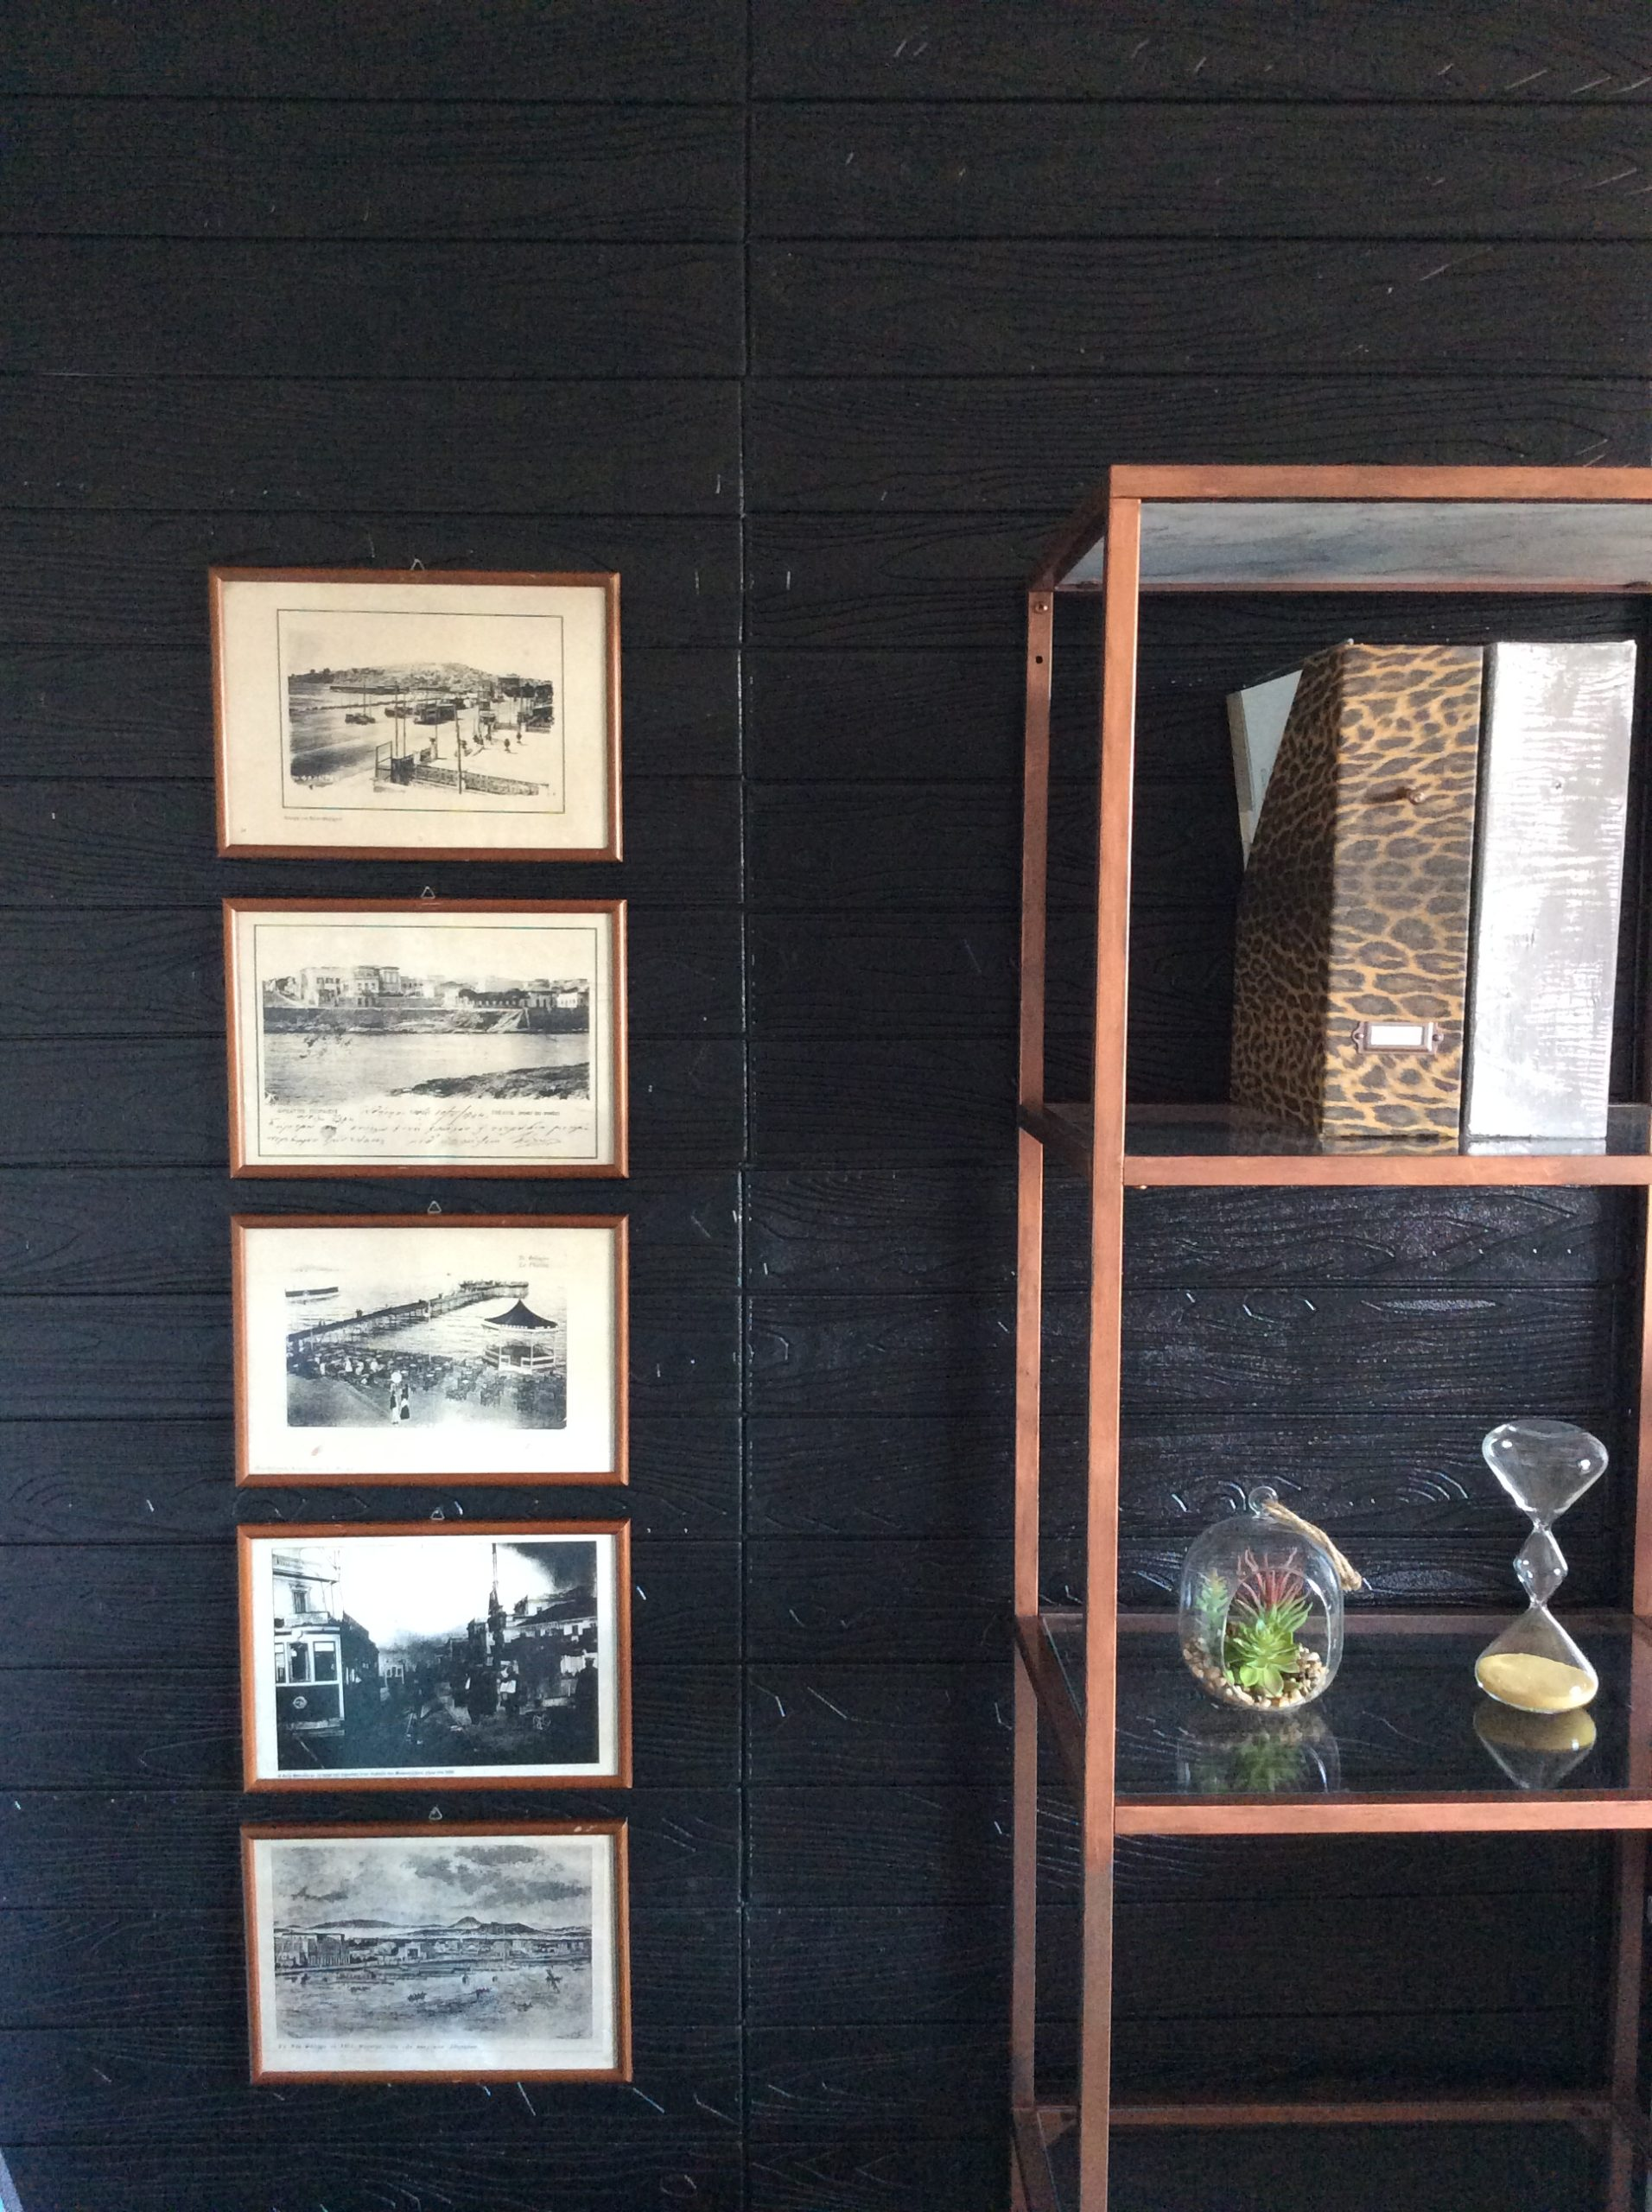 Gallery wall πάλιες γκραβούρες, ΙΚΕΑ Vitsjo βιβλιοθήκη βαμένη σε χάλκινο χρώμα